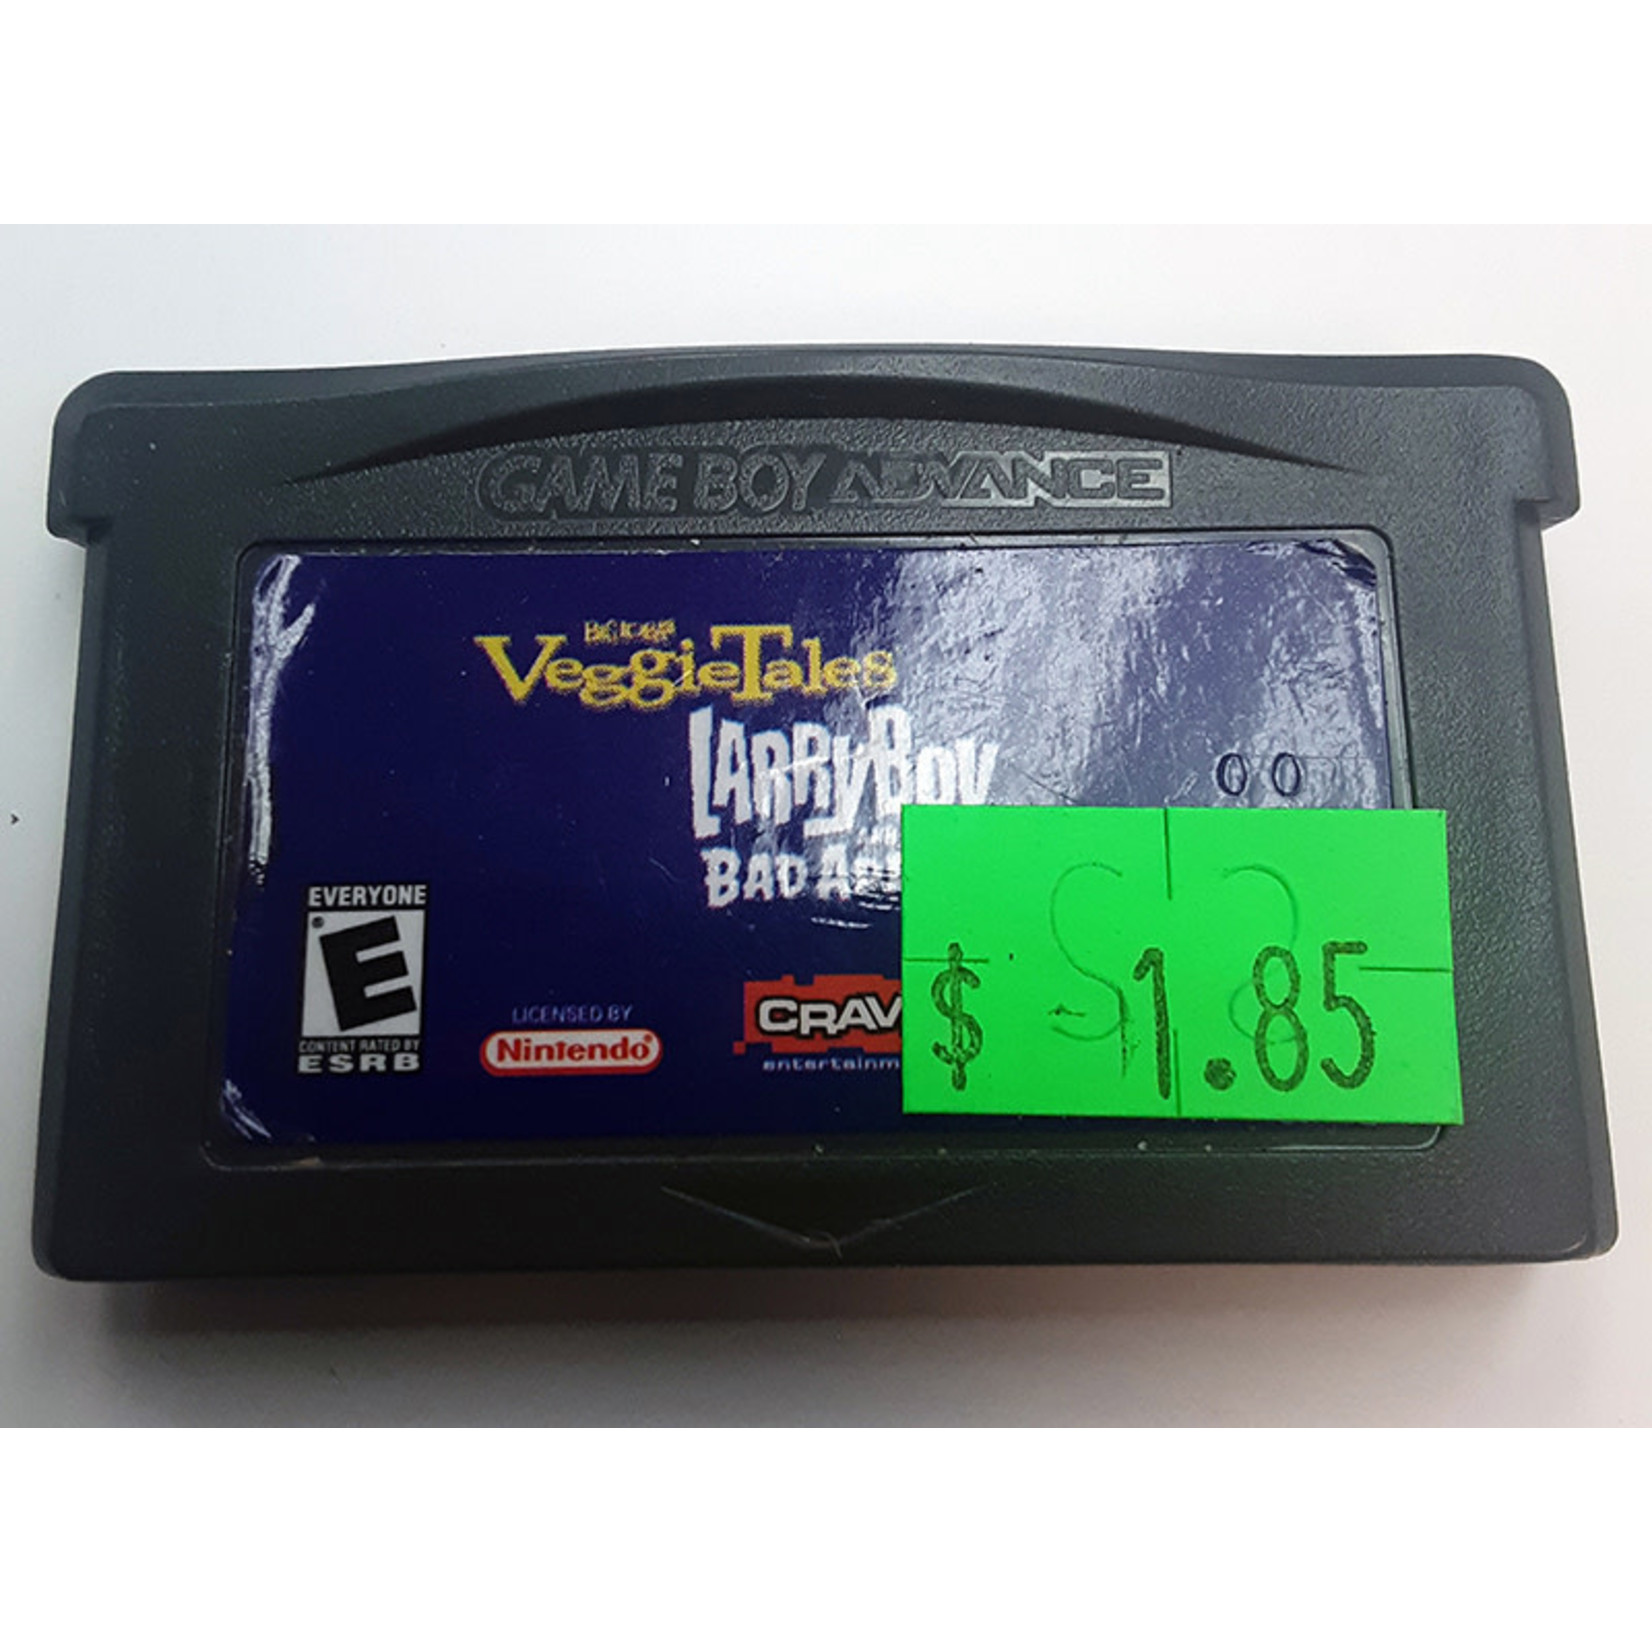 GBAu-Veggie Tales Larry Boy and the Bad Apple (cartridge)